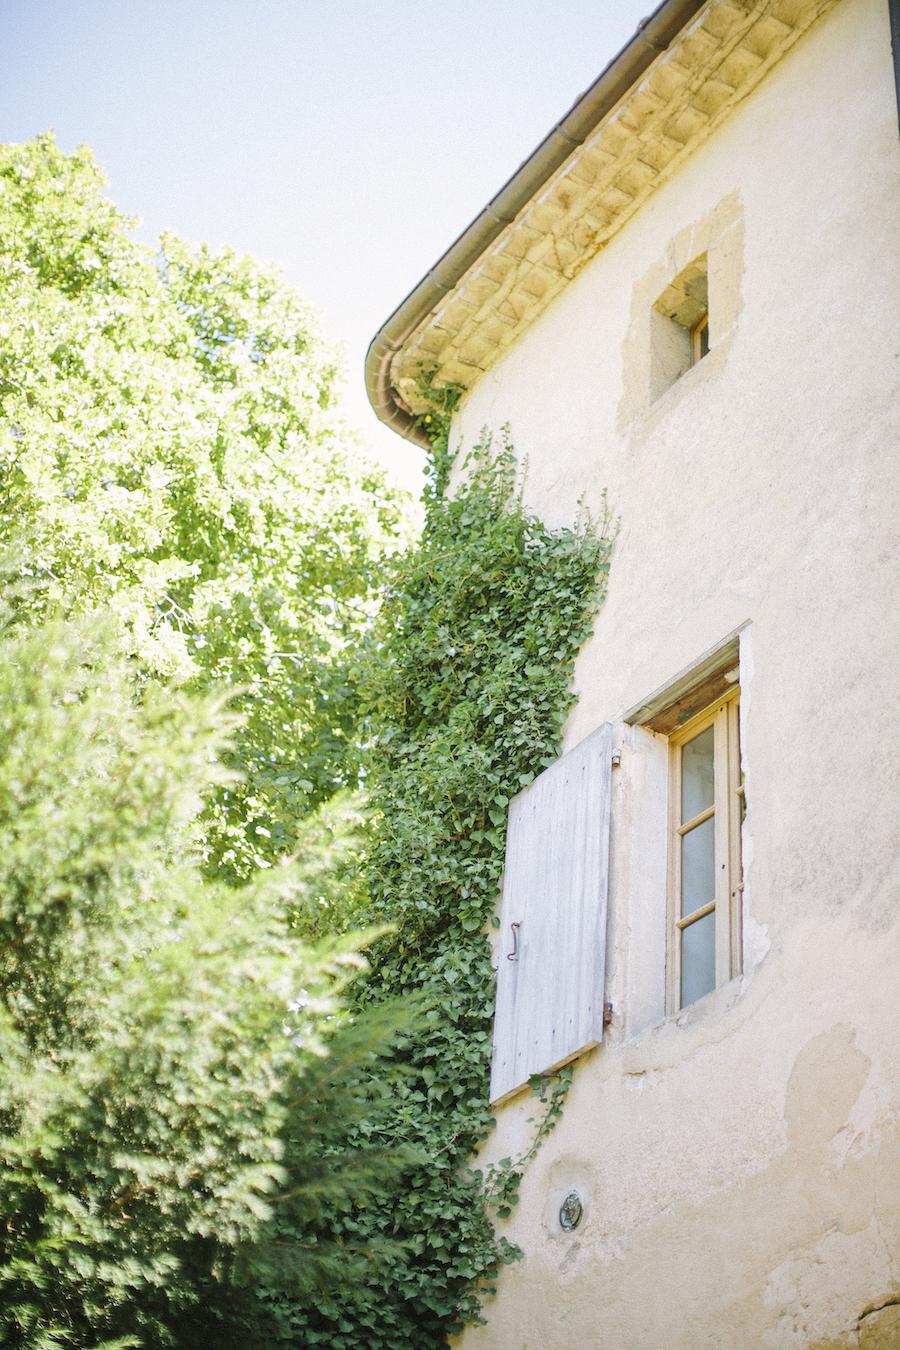 saya-photography-jewish-wedding-provence-rustic-lourmarin-le-galinier-31.jpg